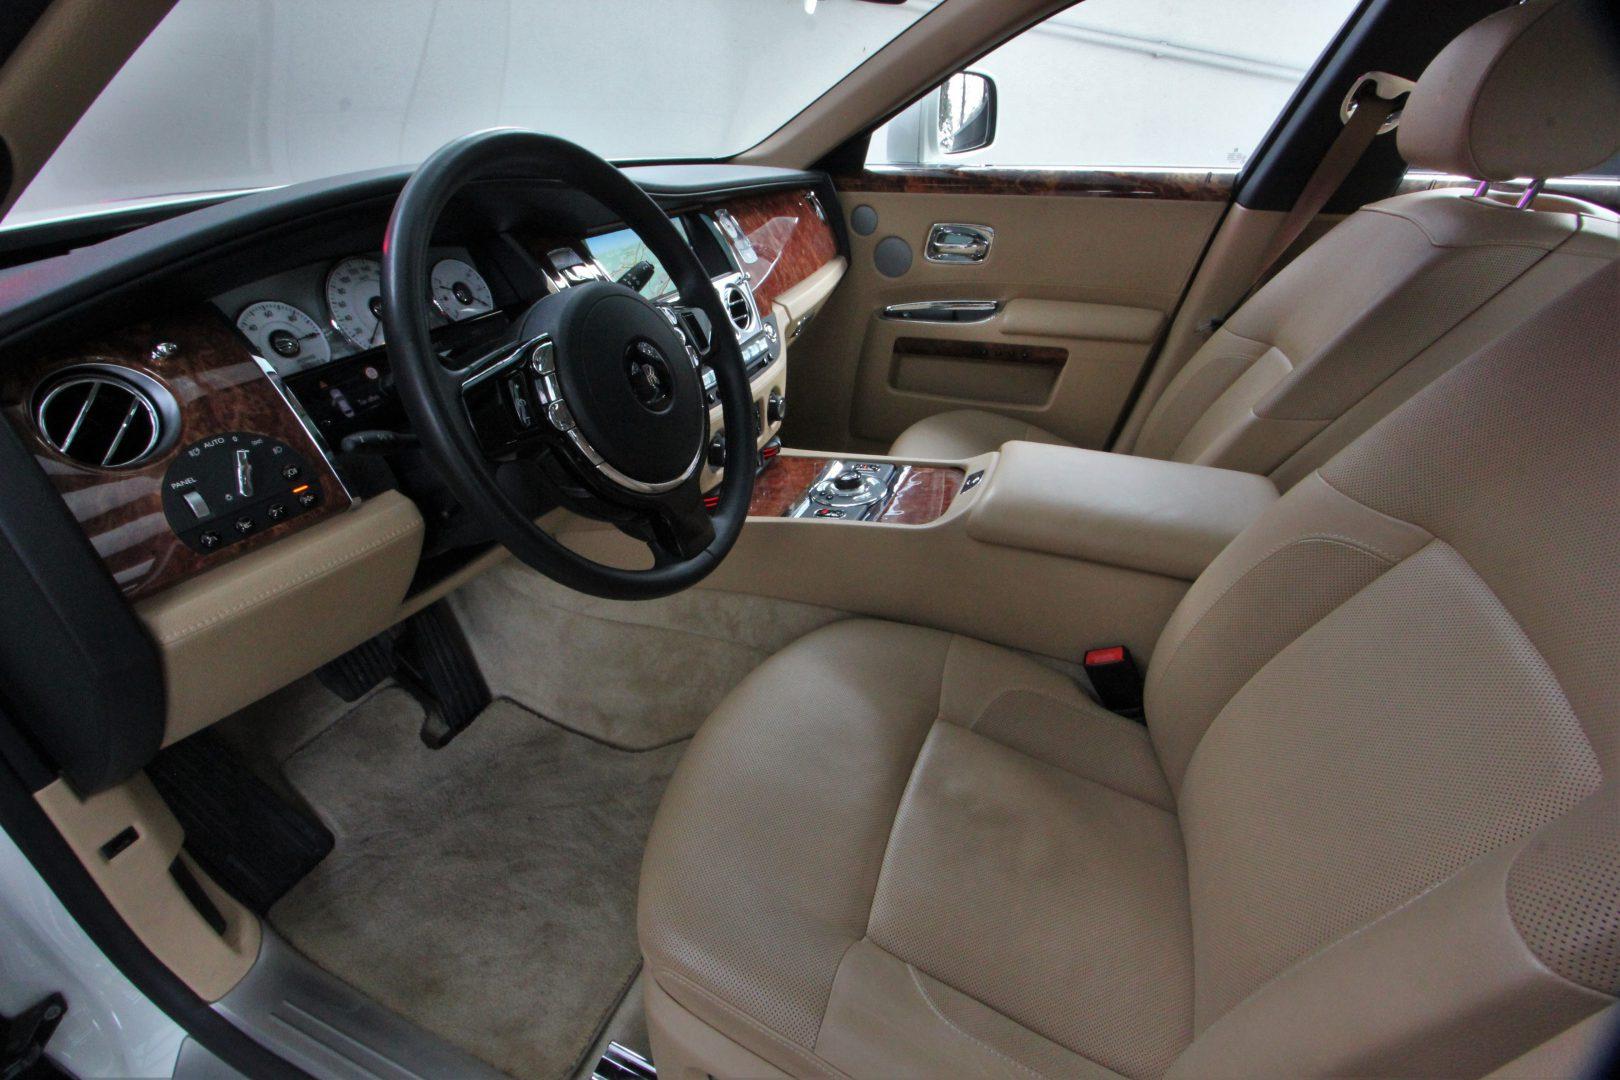 AIL Rolls Royce Ghost 6.6 V12  11